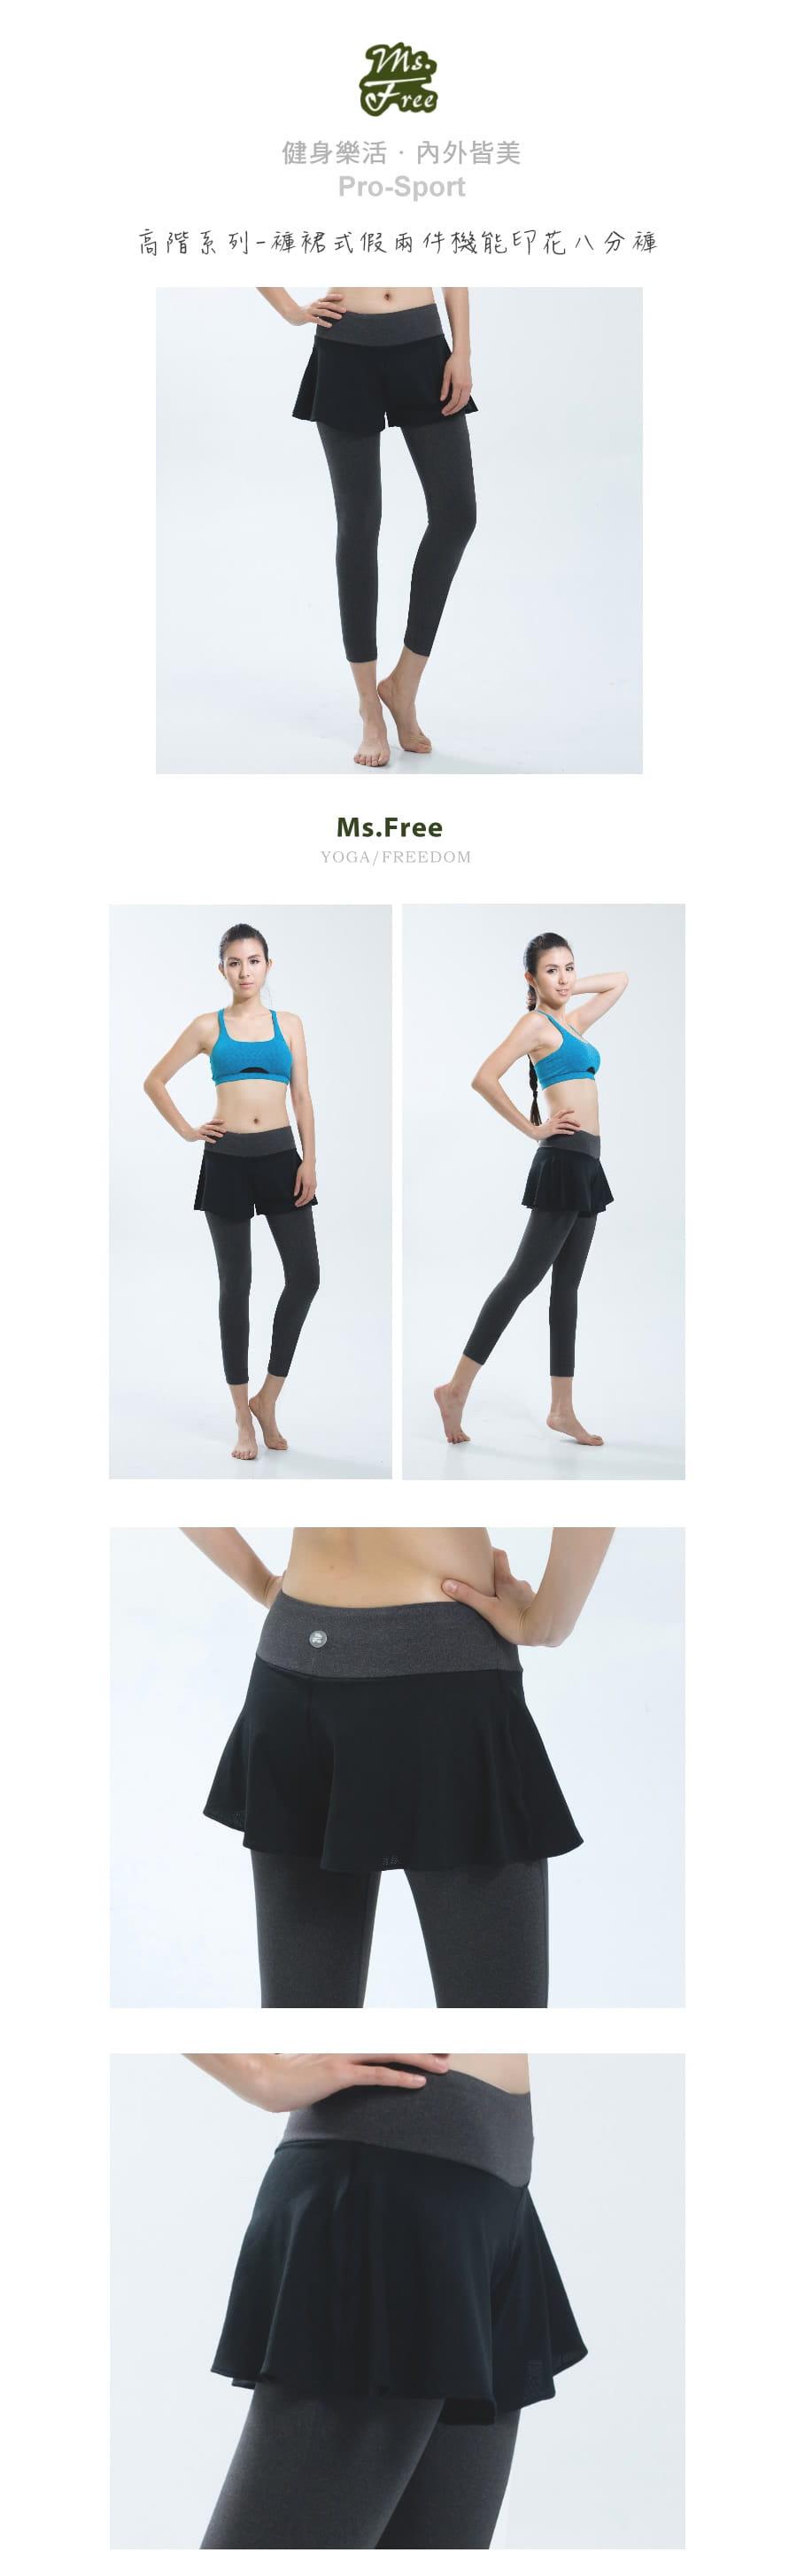 【Ms.Free】Pro高階-台灣製褲裙式假兩件機能八分褲(瑜珈/跳舞/健身)翹臀UP 1